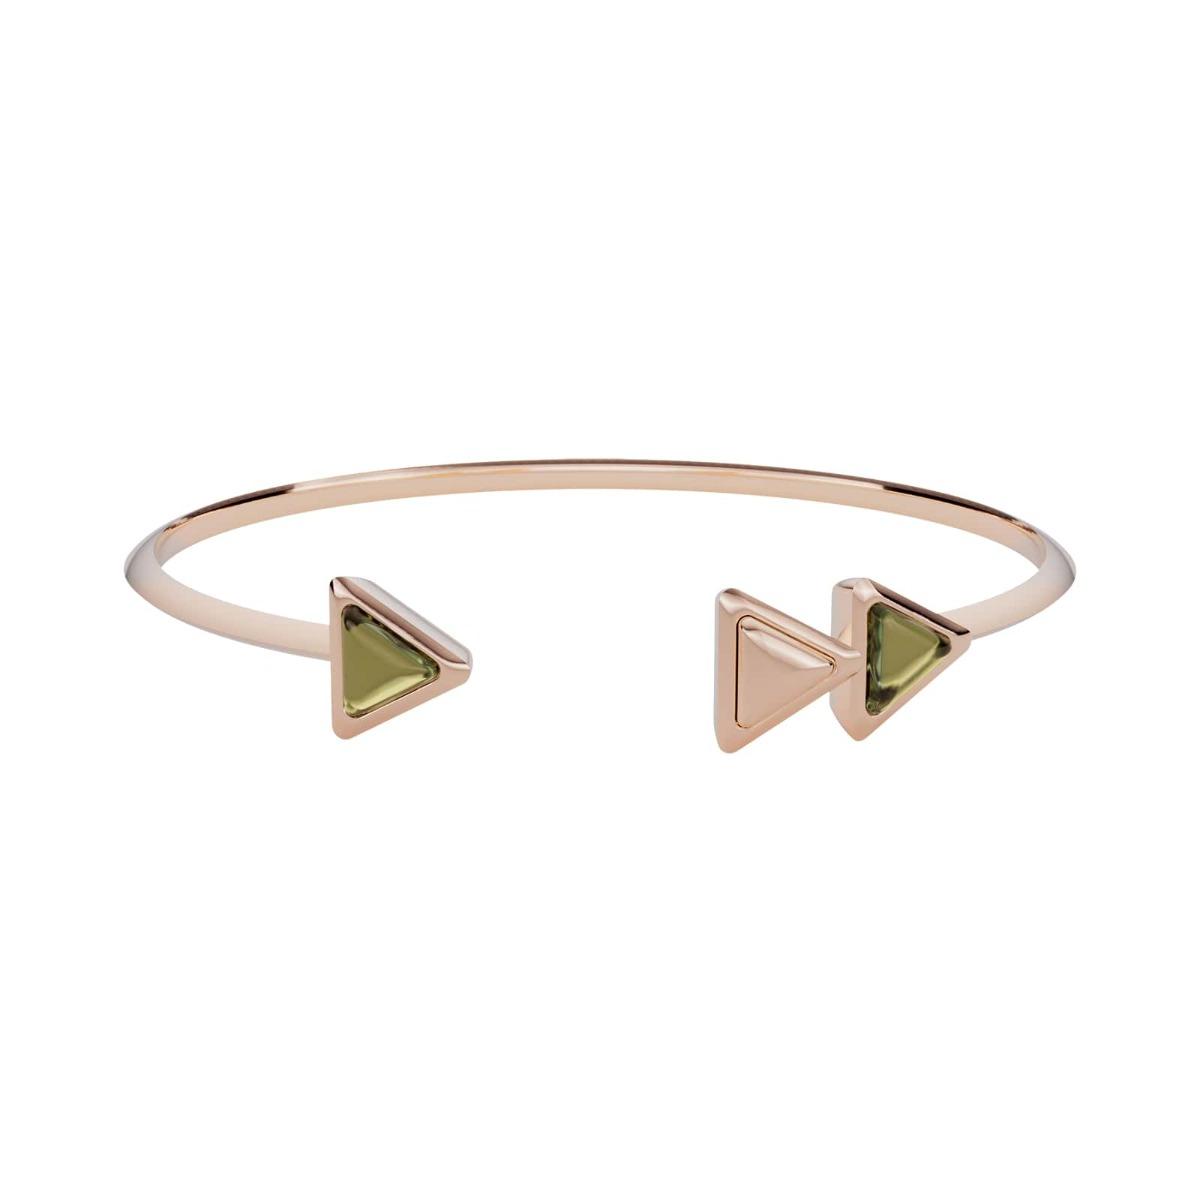 Bracelet Dove Vai Forward Gem Rose Gold Green Tourmaline